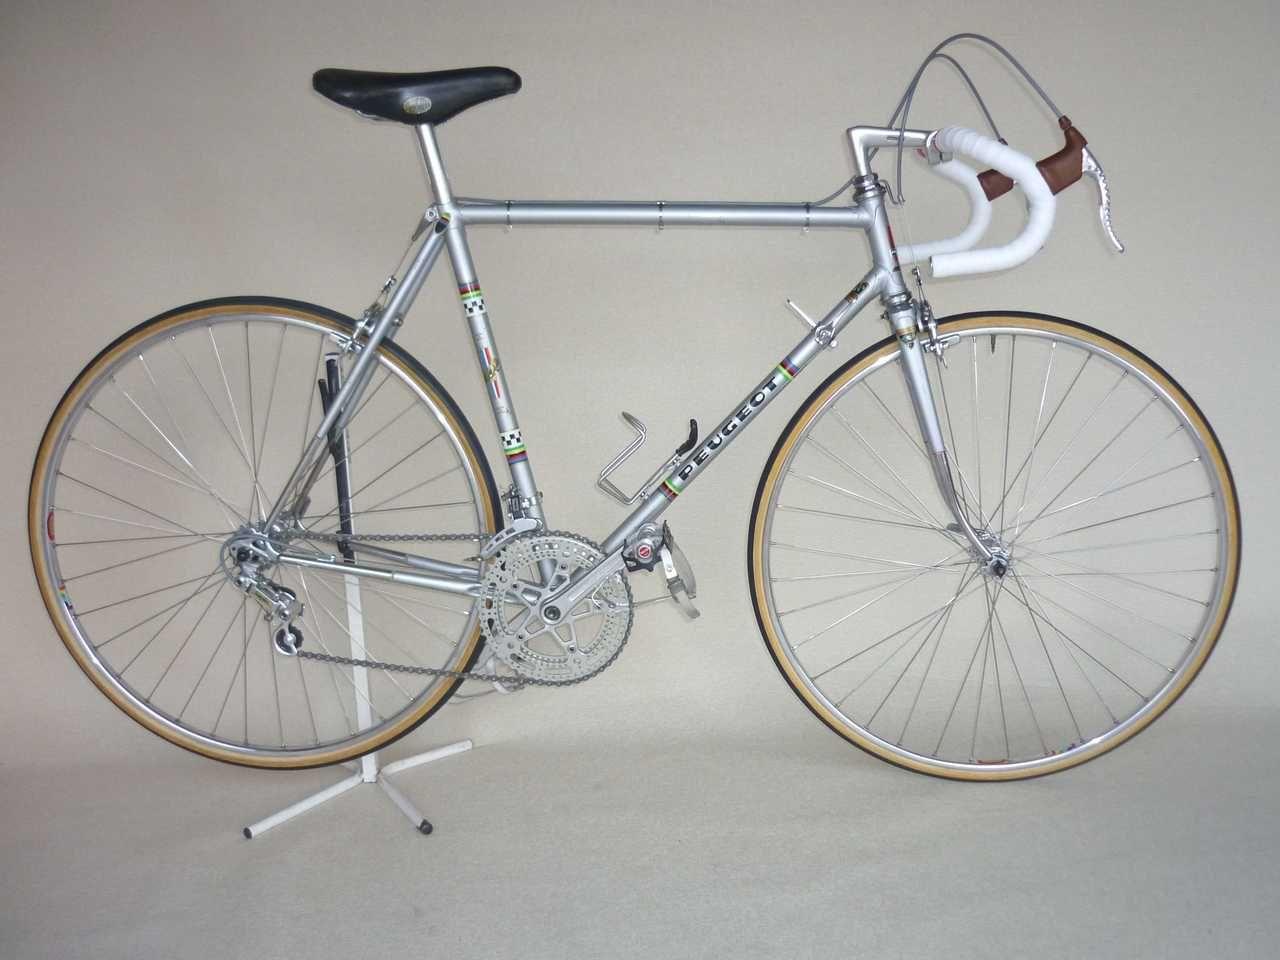 Vélo Peugeot PY10 | Vélo | Pinterest | Cycling